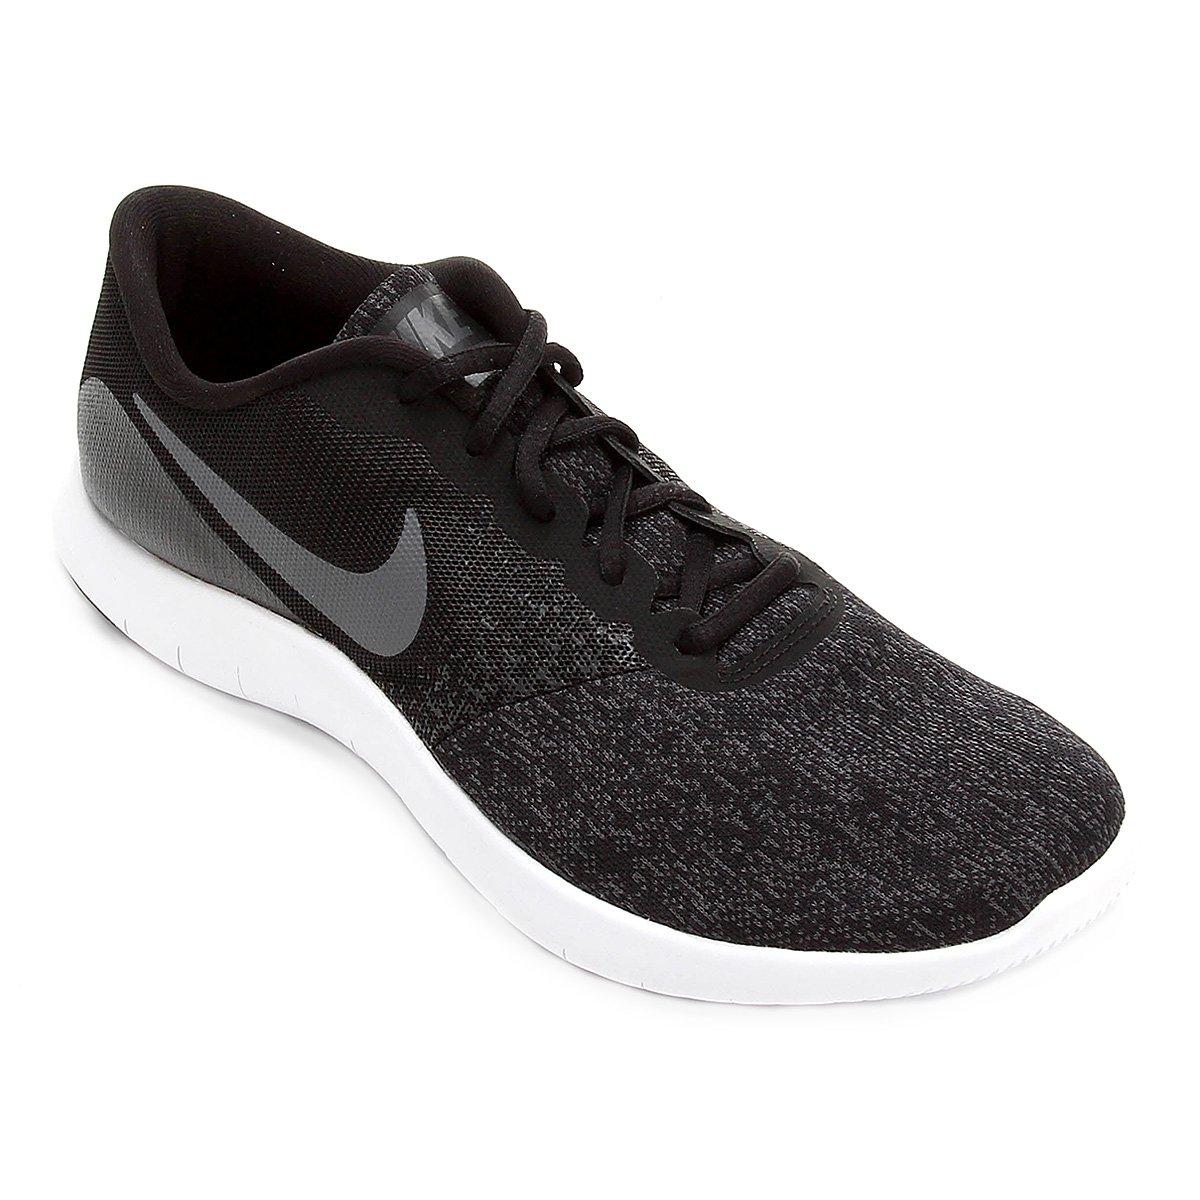 5a61dc383 Tênis Nike Flex Contact Masculino - Preto e Cinza | Loja do Inter